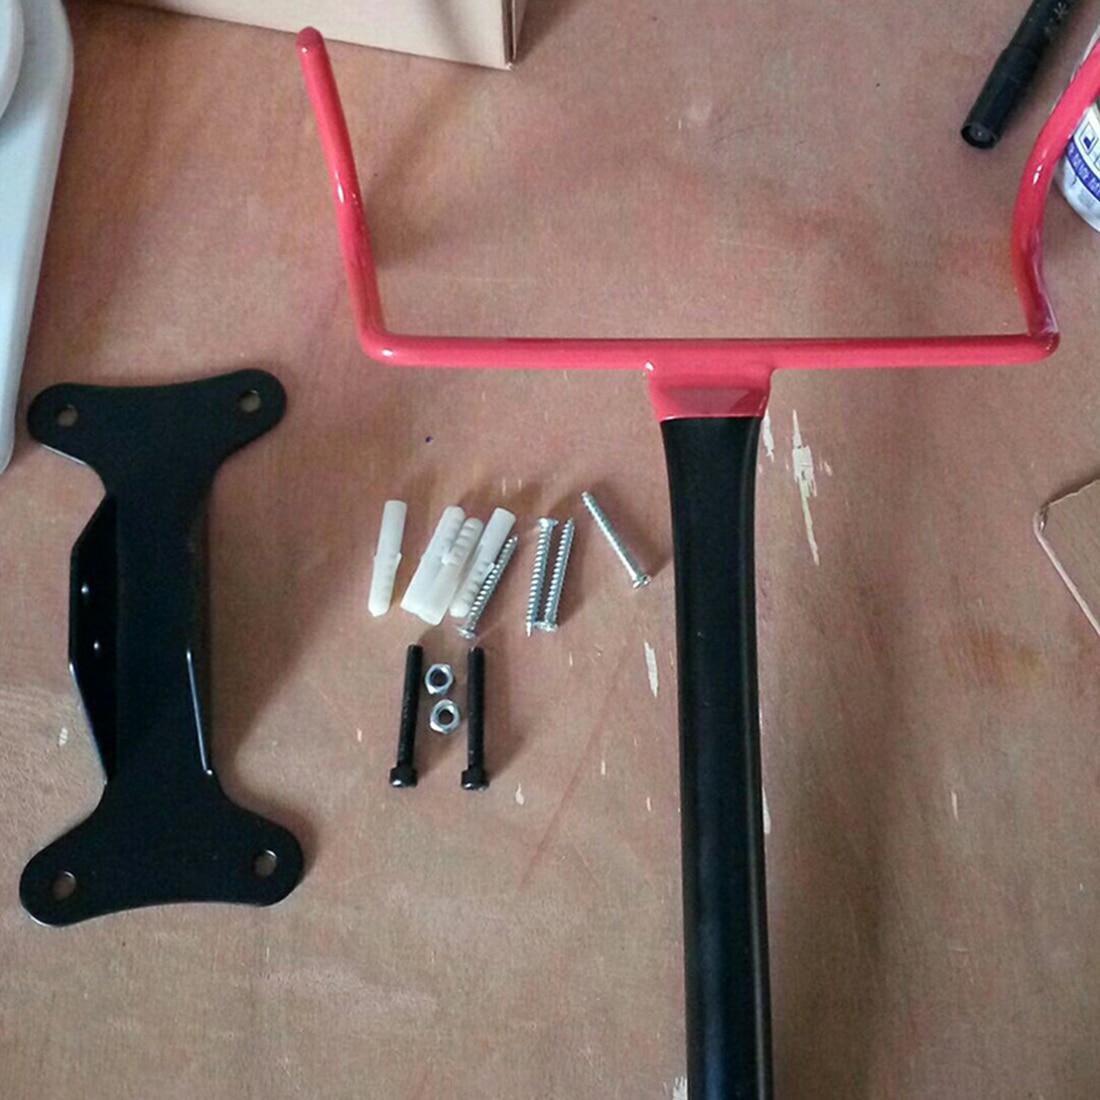 Bicycle Bike Holder Tough Steel Storage Parking Rack Mount Hanger Hook Garage Wall Bike Stand Rack Bicycle Hook Holder Racks Red